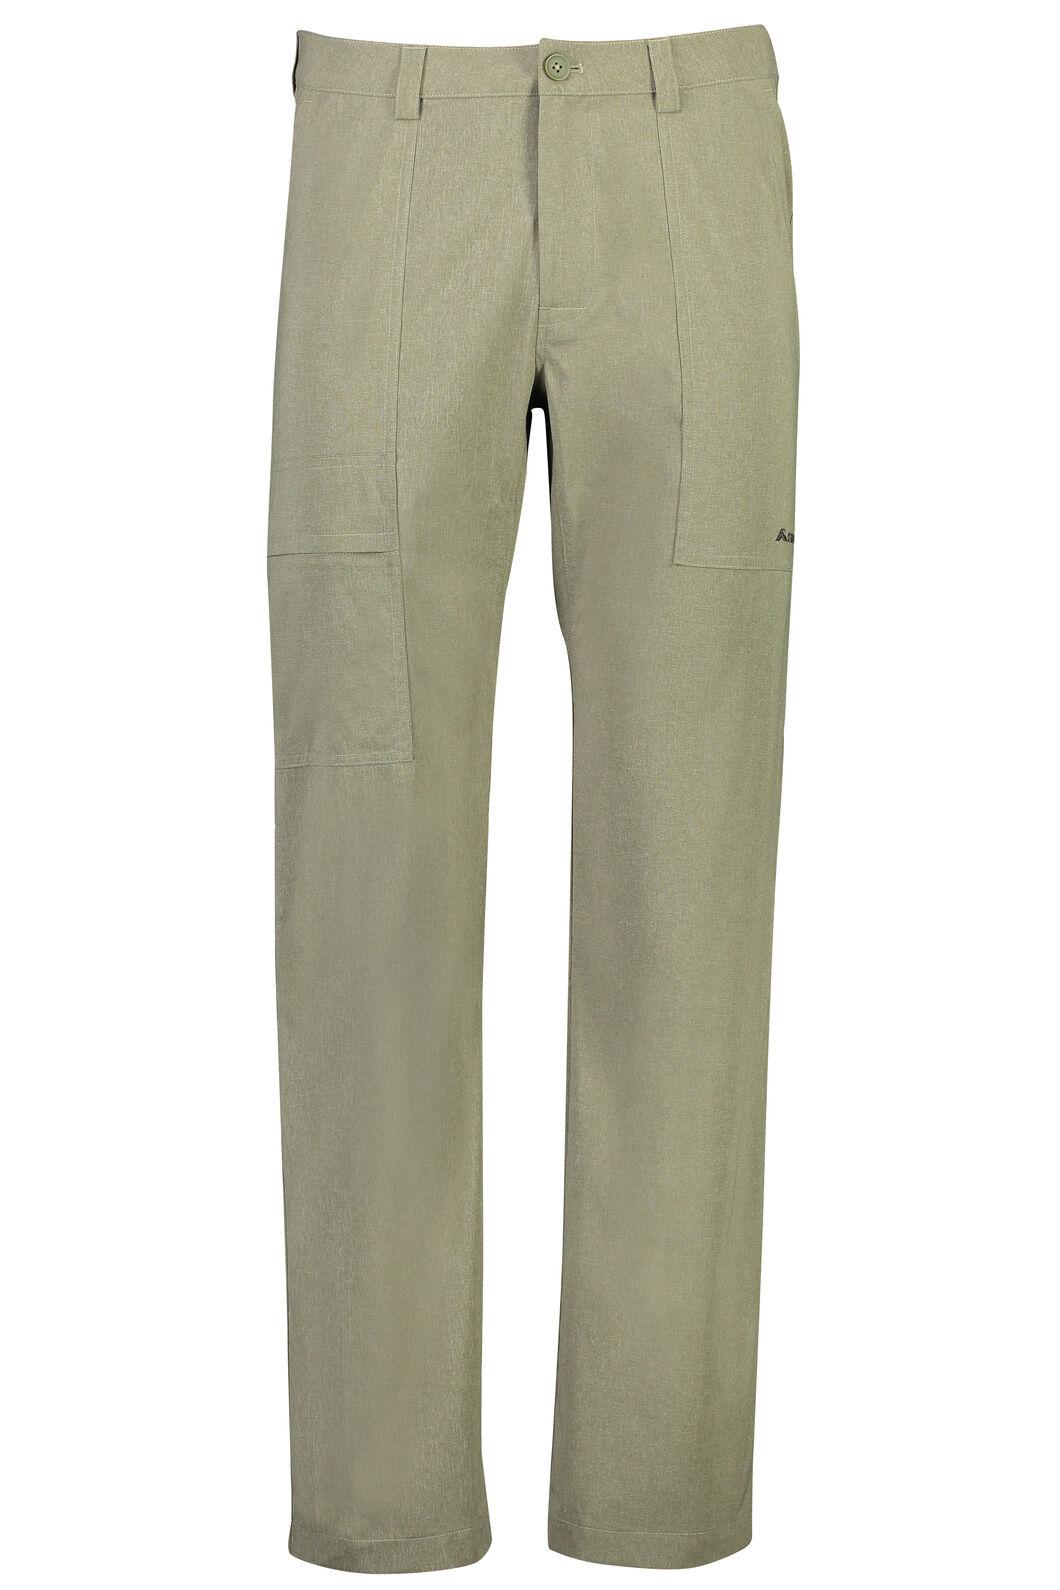 Just Enough Pants - Men's, Grape Leaf, hi-res